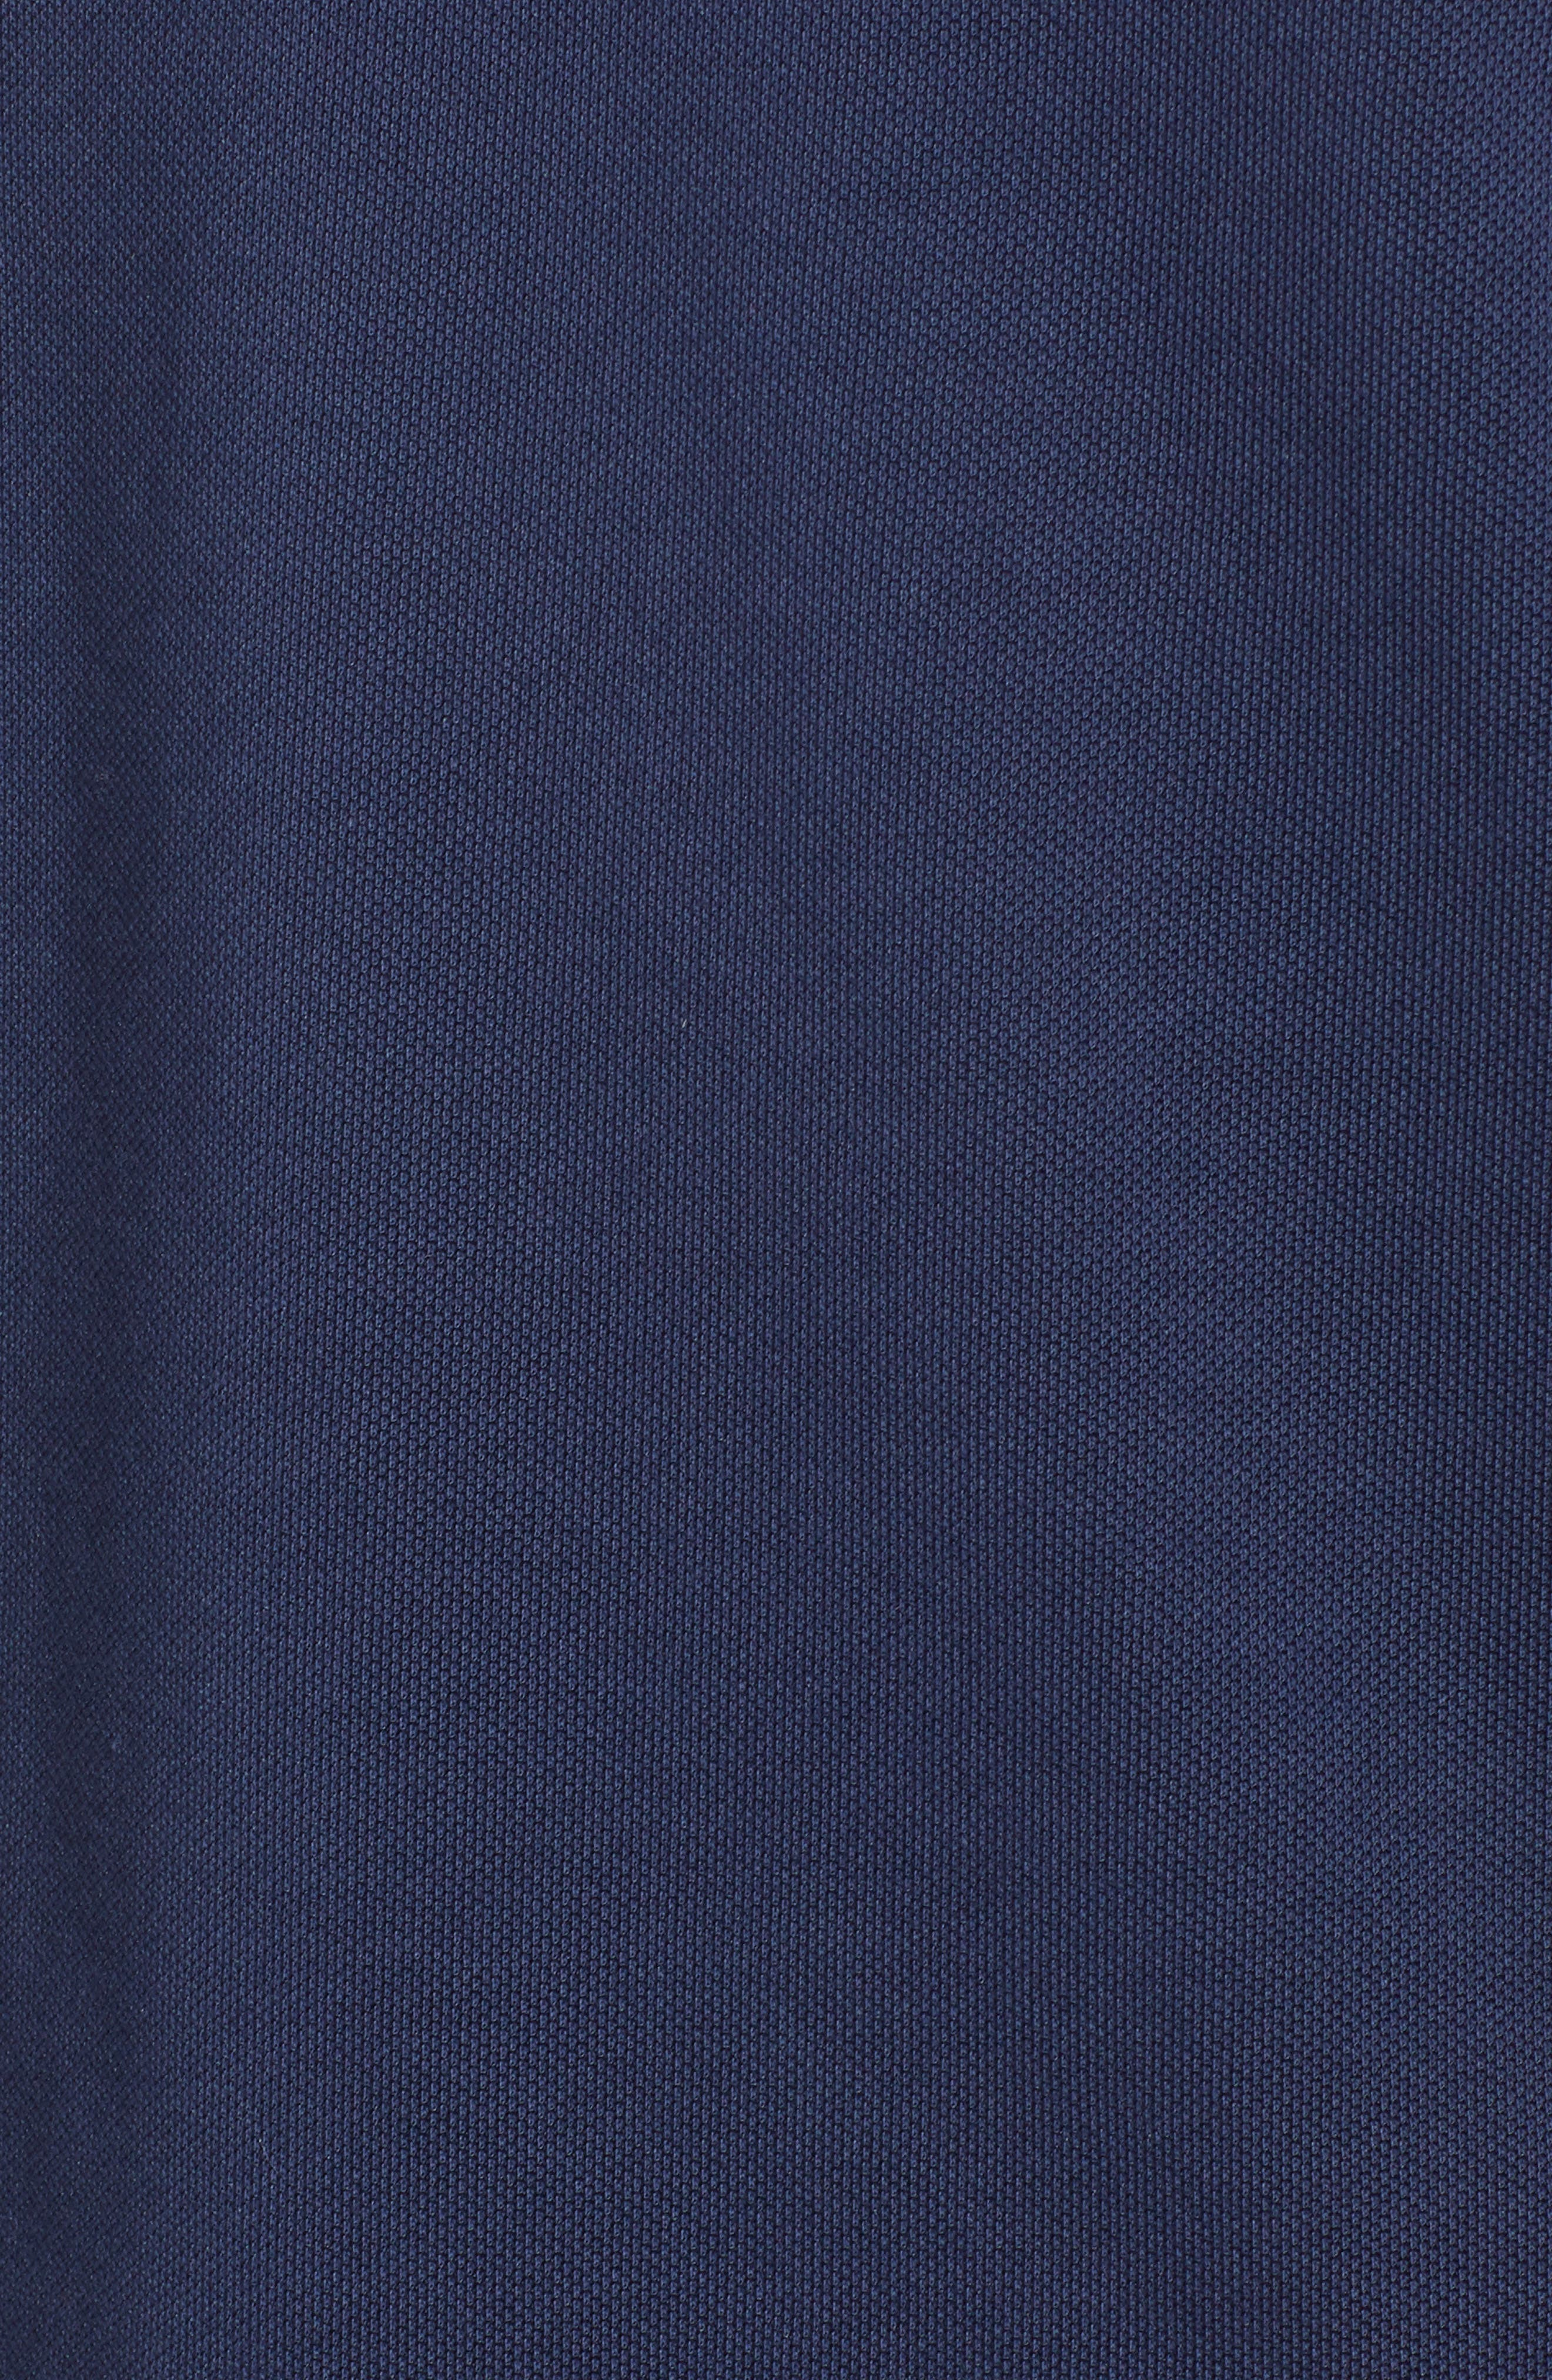 Piqué Cotton Blend Polo,                             Alternate thumbnail 5, color,                             WHITE/ NAVY BLUE